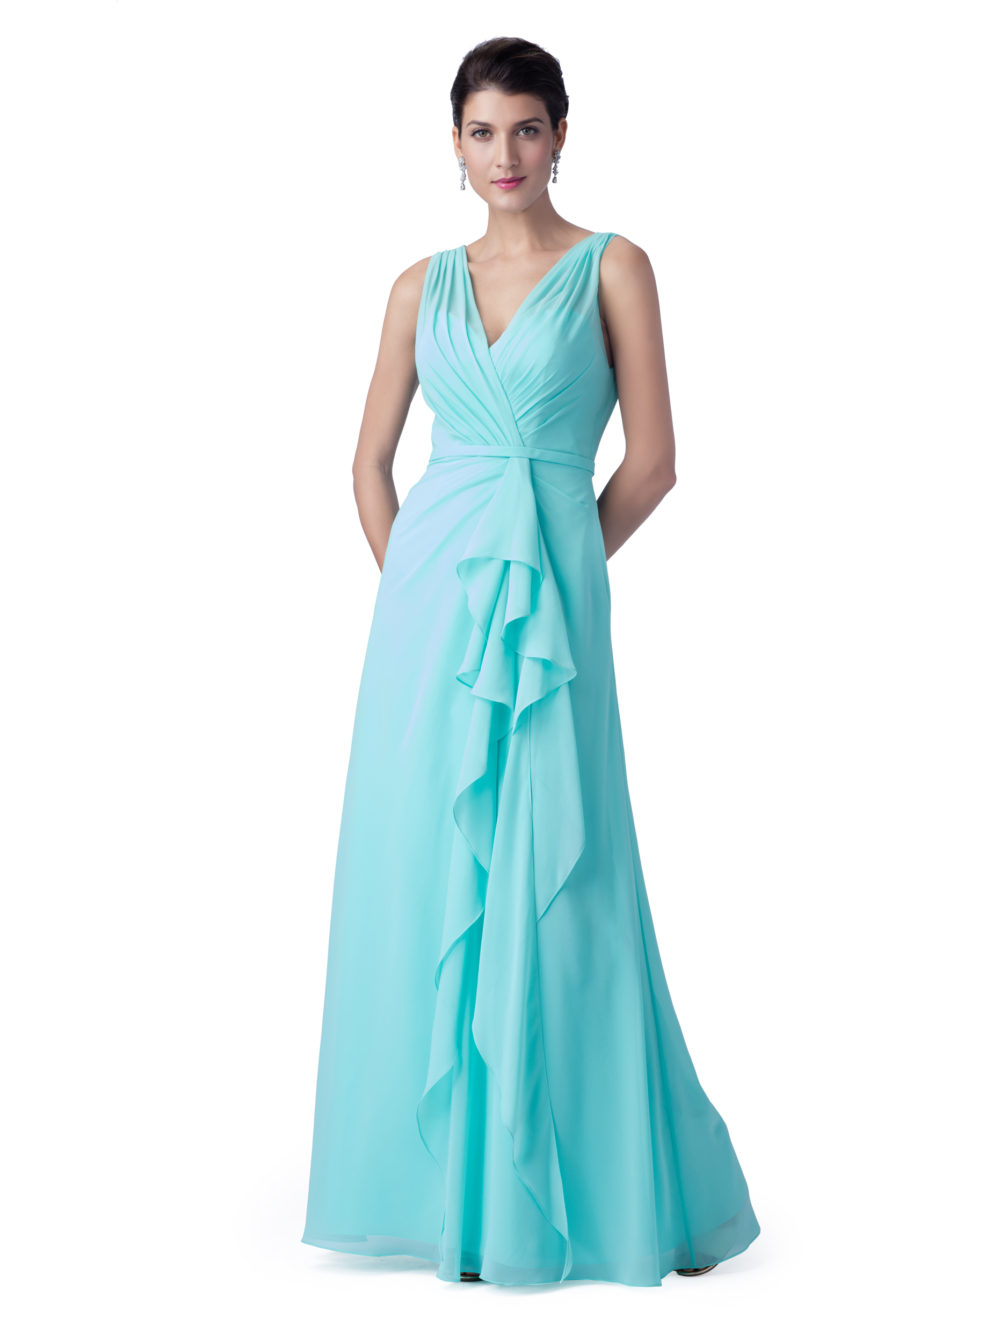 Ice Blue Long Chiffon Bridesmaid Dresses 2019 V Neck Tank Straps pleats A-line Floor Length Elegant Women Summer Formal Dress